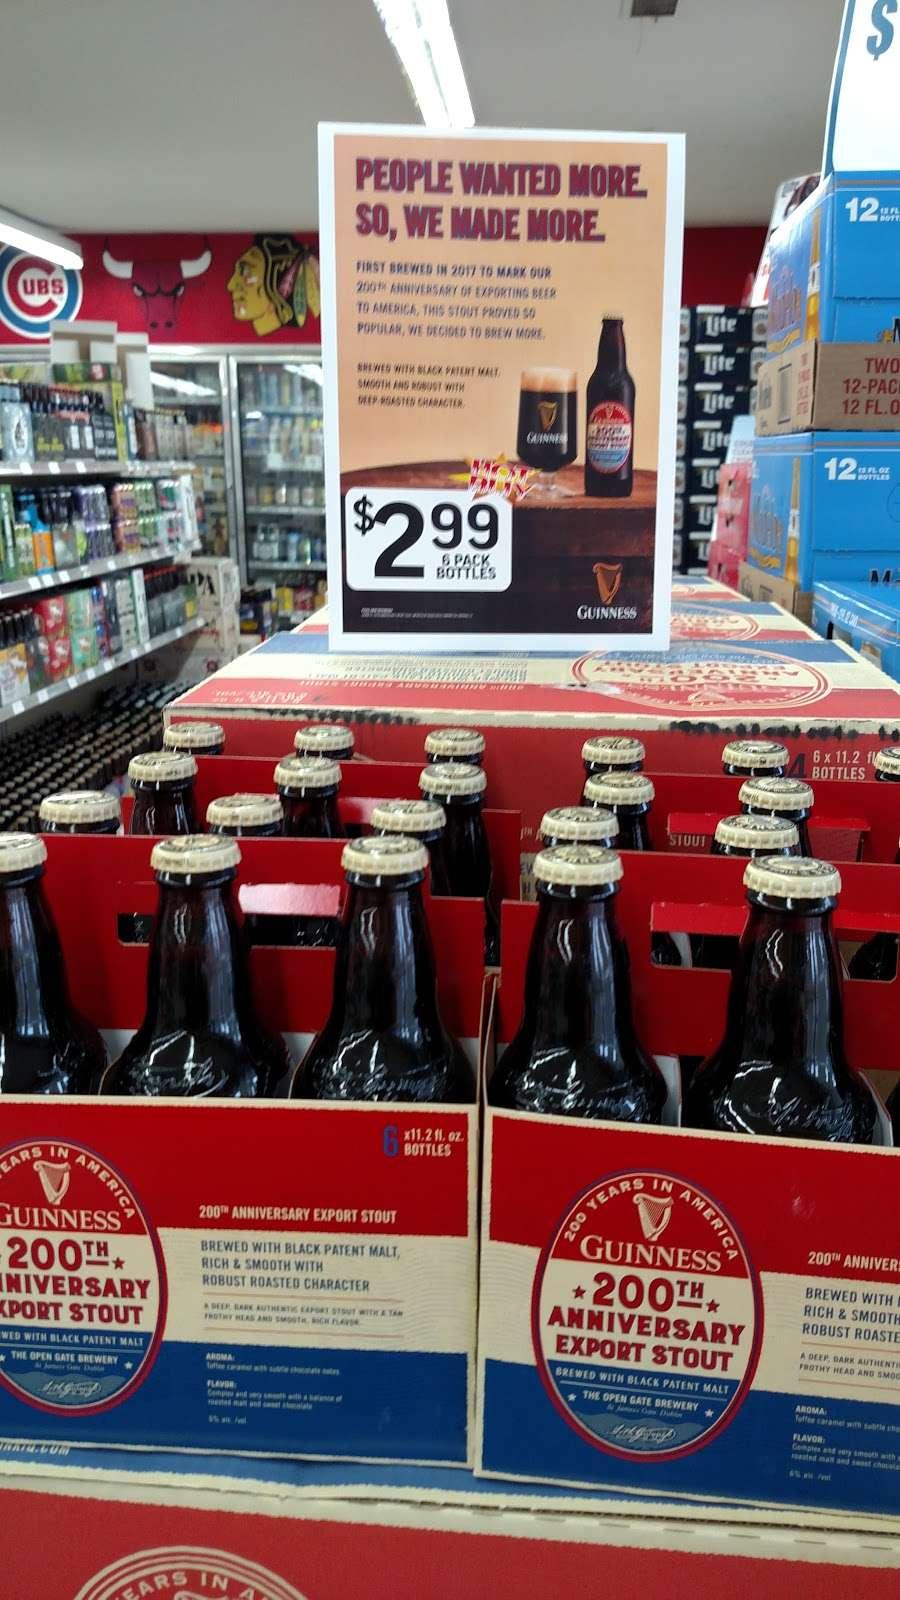 Consumers Liquor Stores Inc - store  | Photo 8 of 10 | Address: 1134 Plainfield Rd, Joliet, IL 60435, USA | Phone: (815) 723-7331